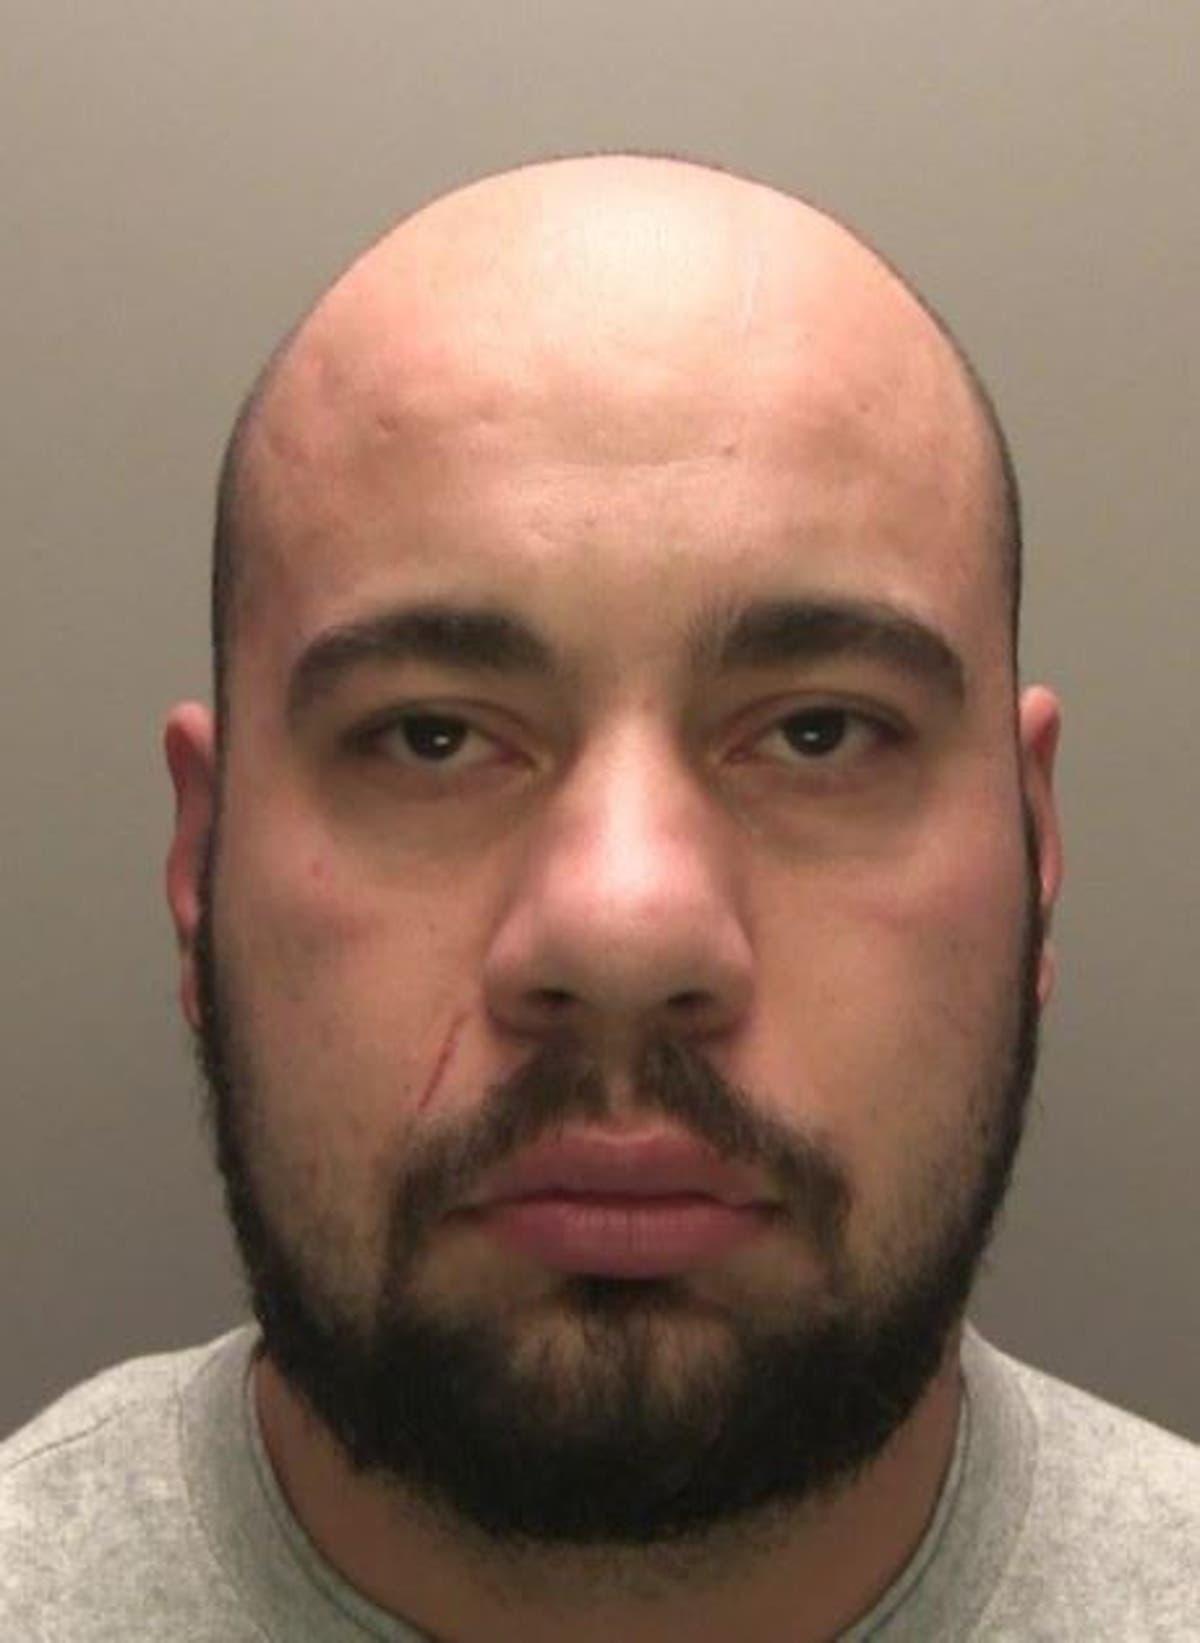 Rapist jailed after bundling woman into car in East London